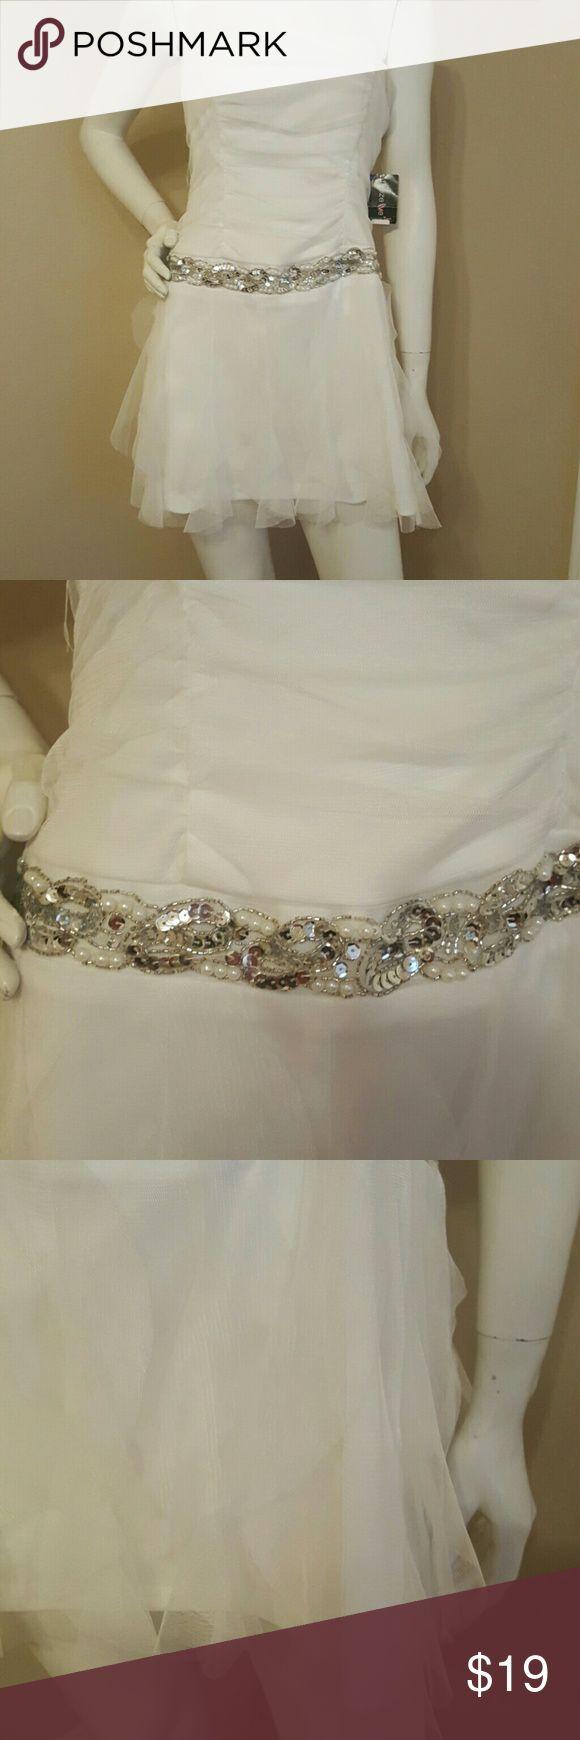 Junior white coctail party dress size 9 Brand new white dress Teeze Me Dresses Mini